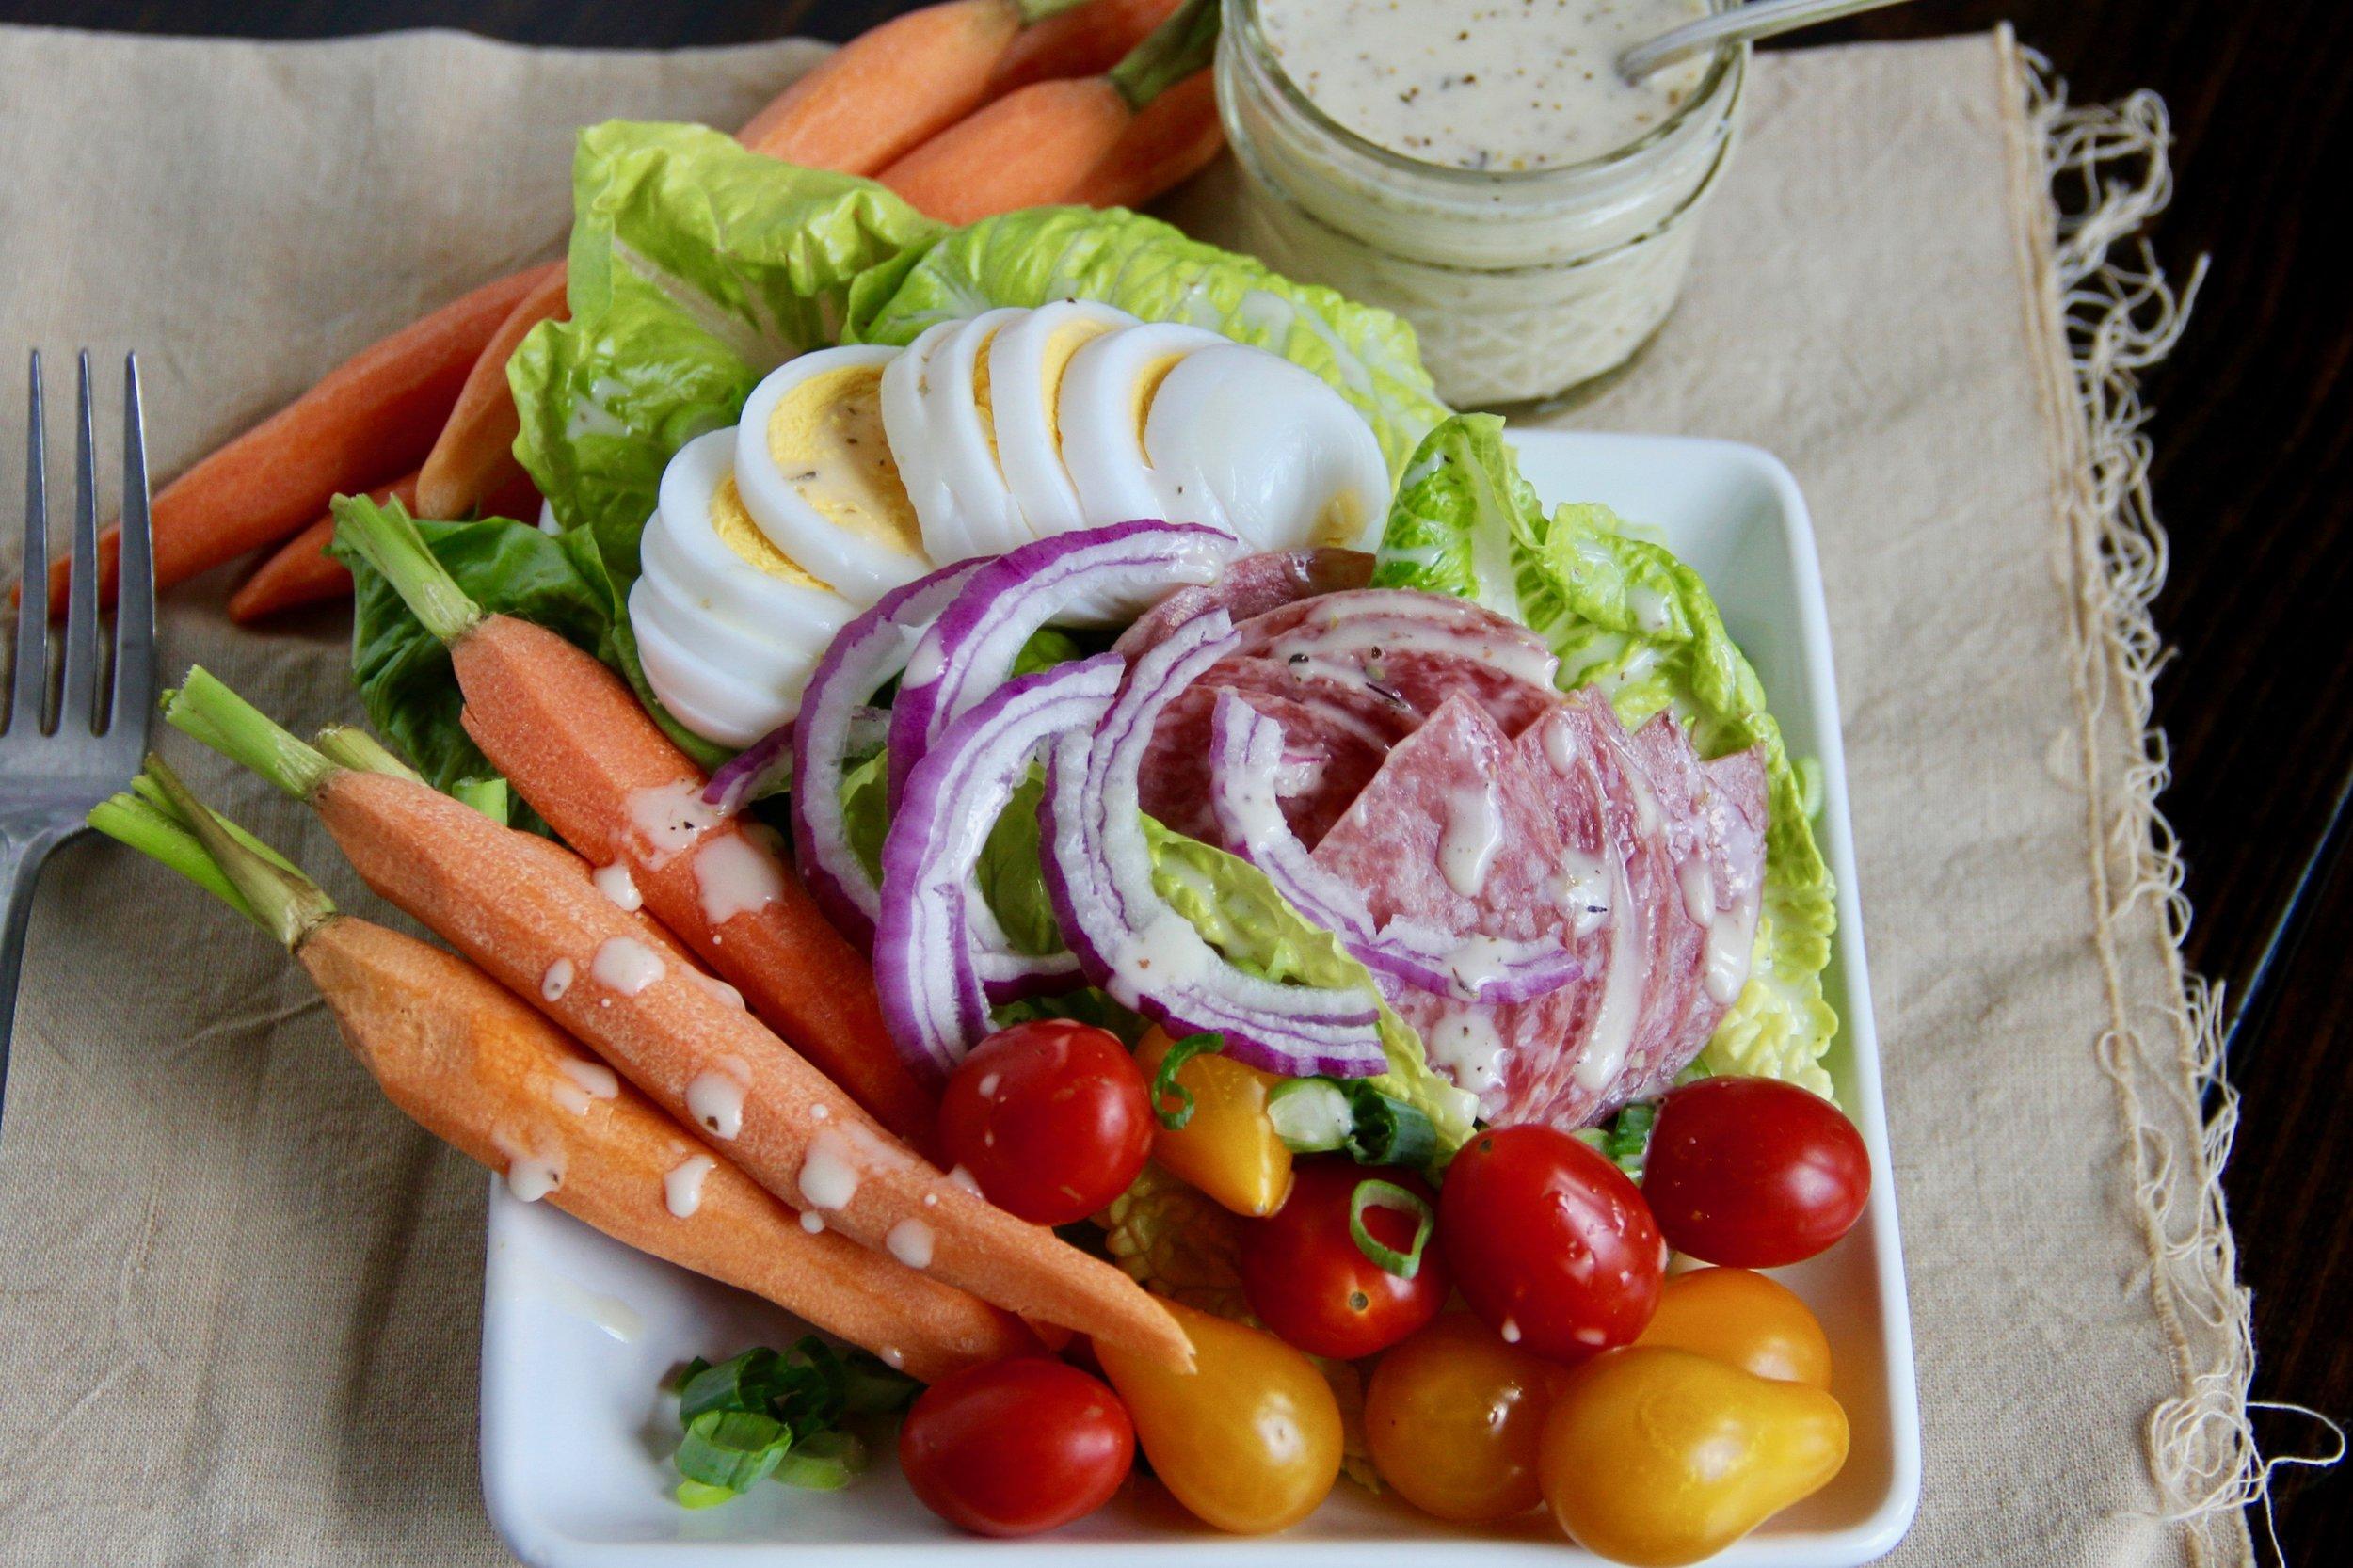 Cobb Salad with Creamy Italian Dressing